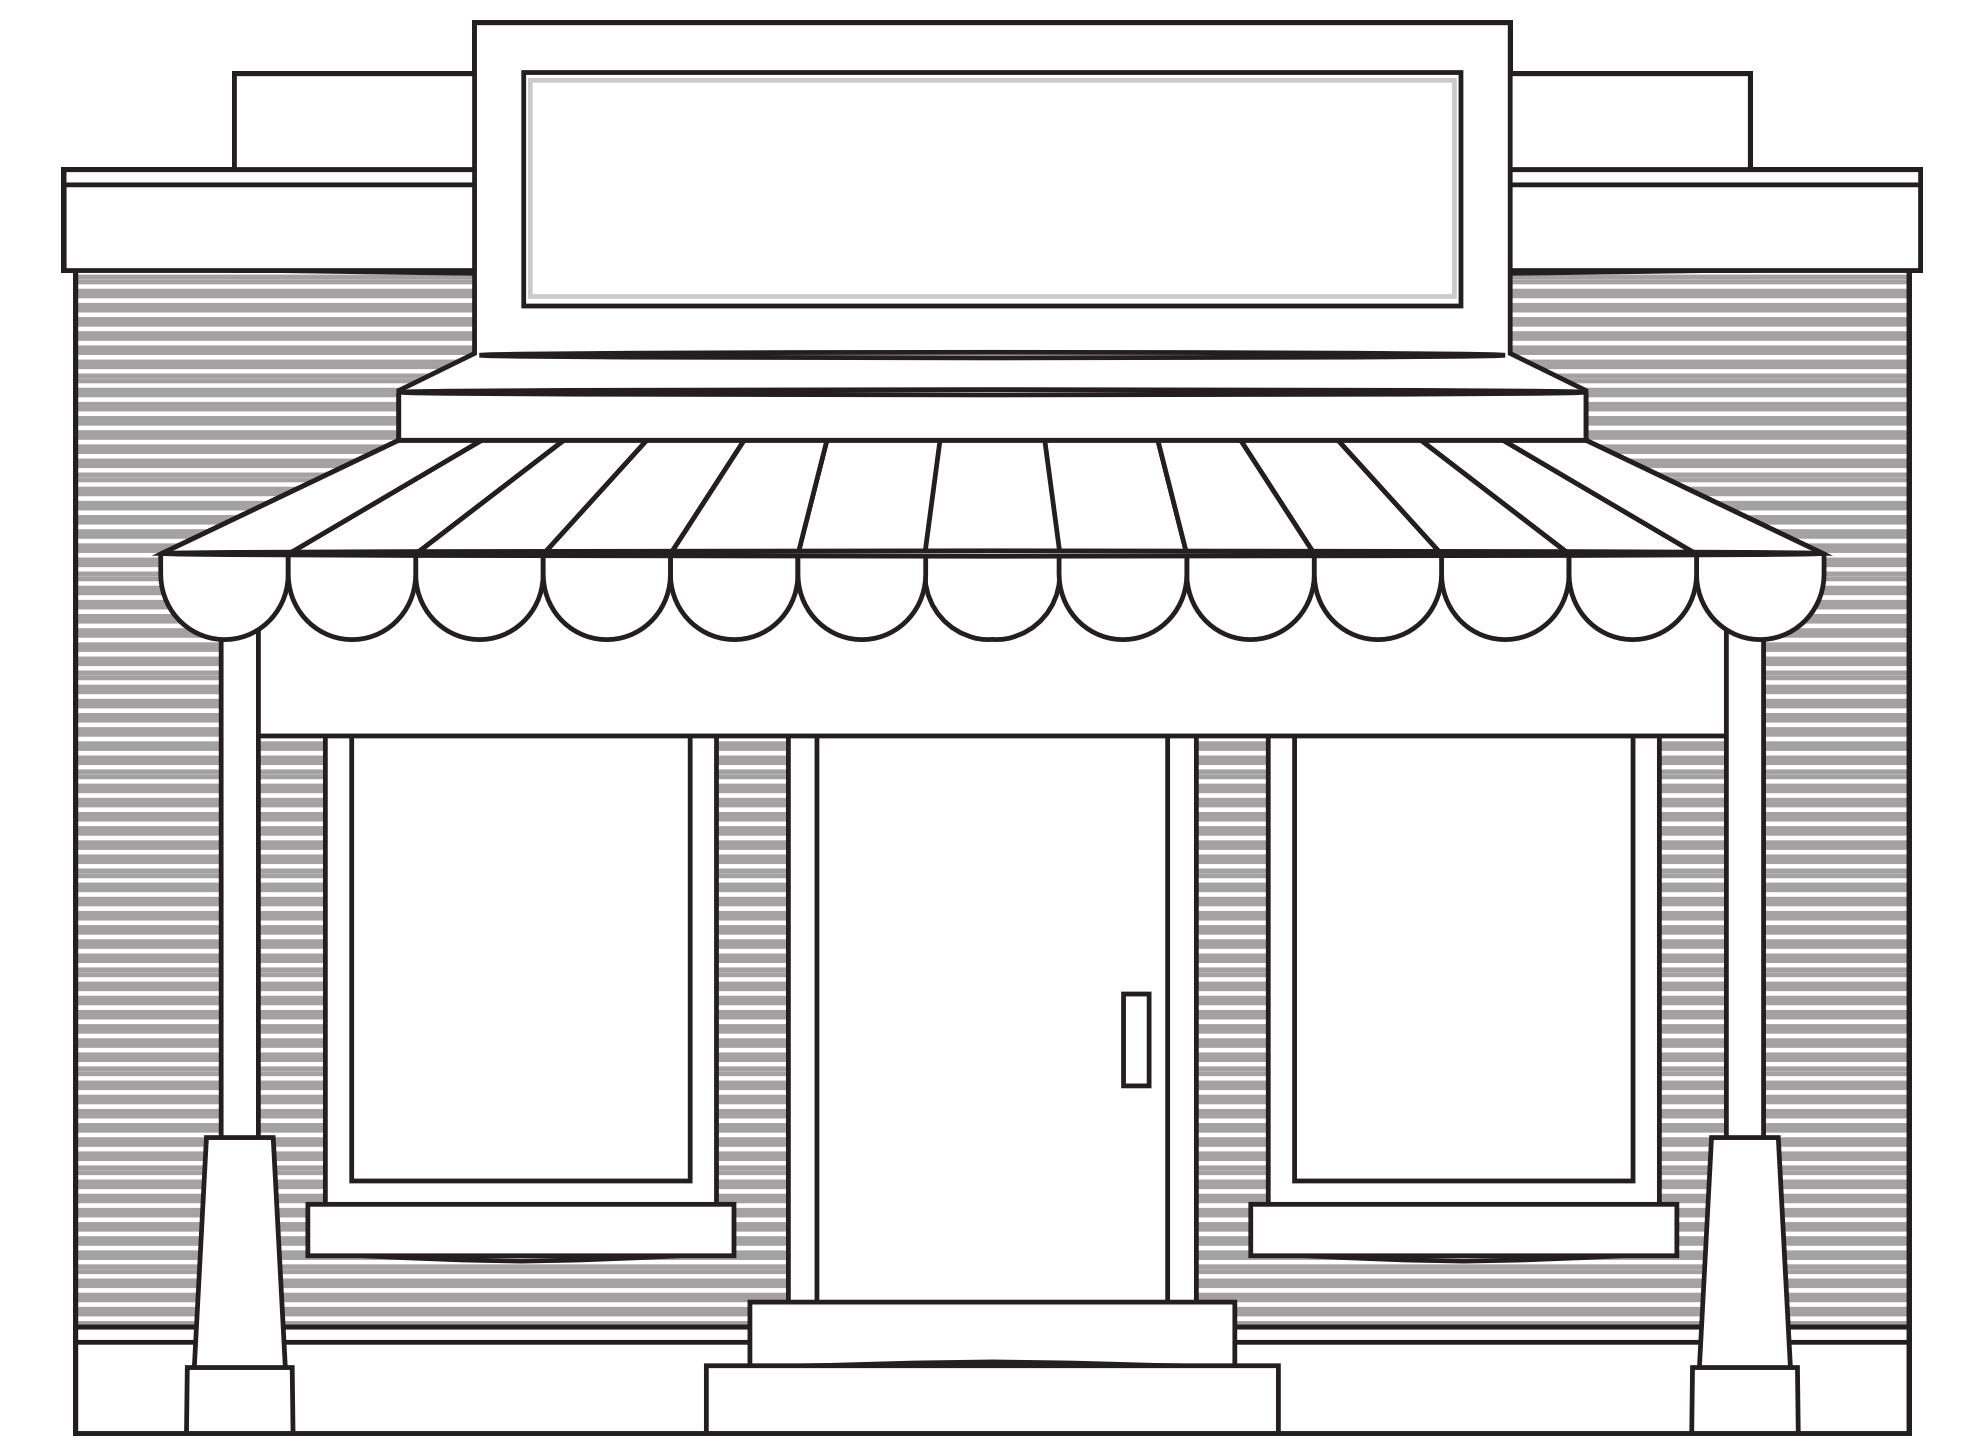 Sari sari store clipart black and white clip library library Free Store Cliparts, Download Free Clip Art, Free Clip Art on ... clip library library